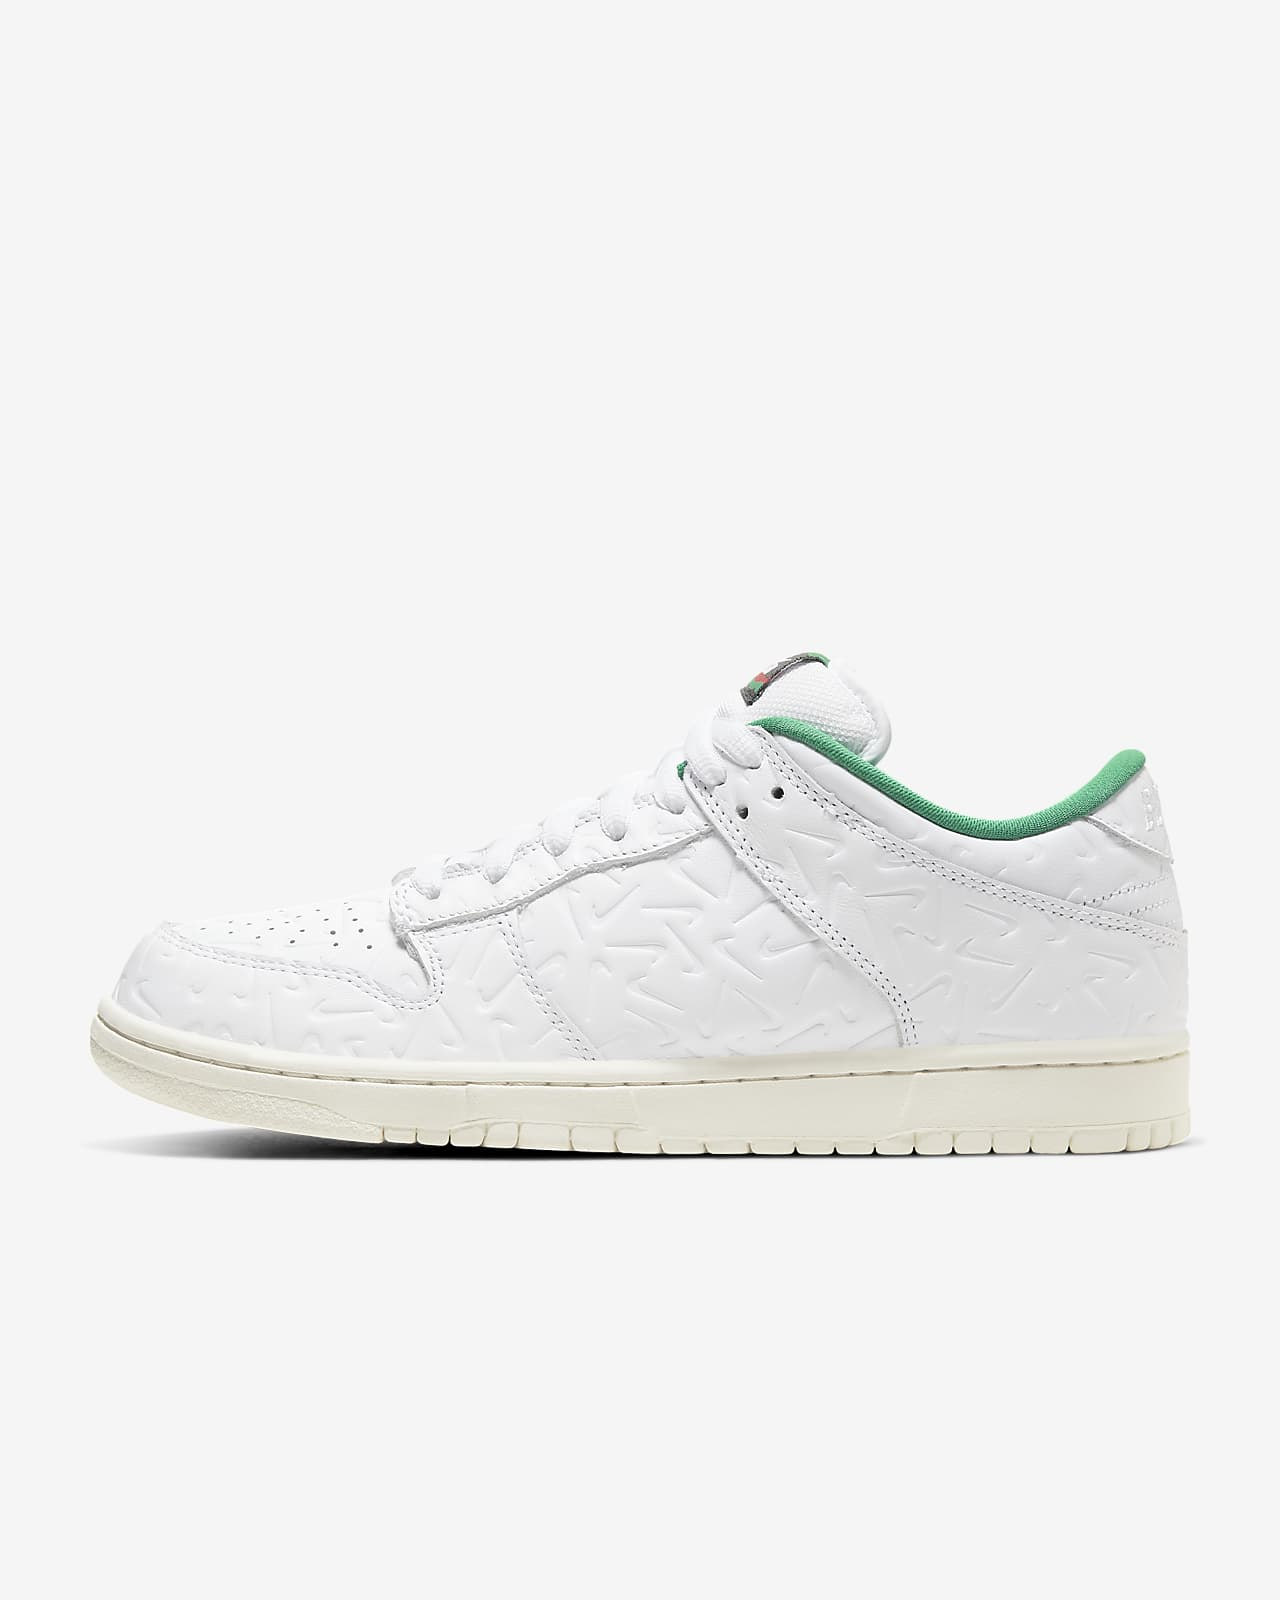 Nike SB Dunk Low OG QS 2 男/女运动鞋